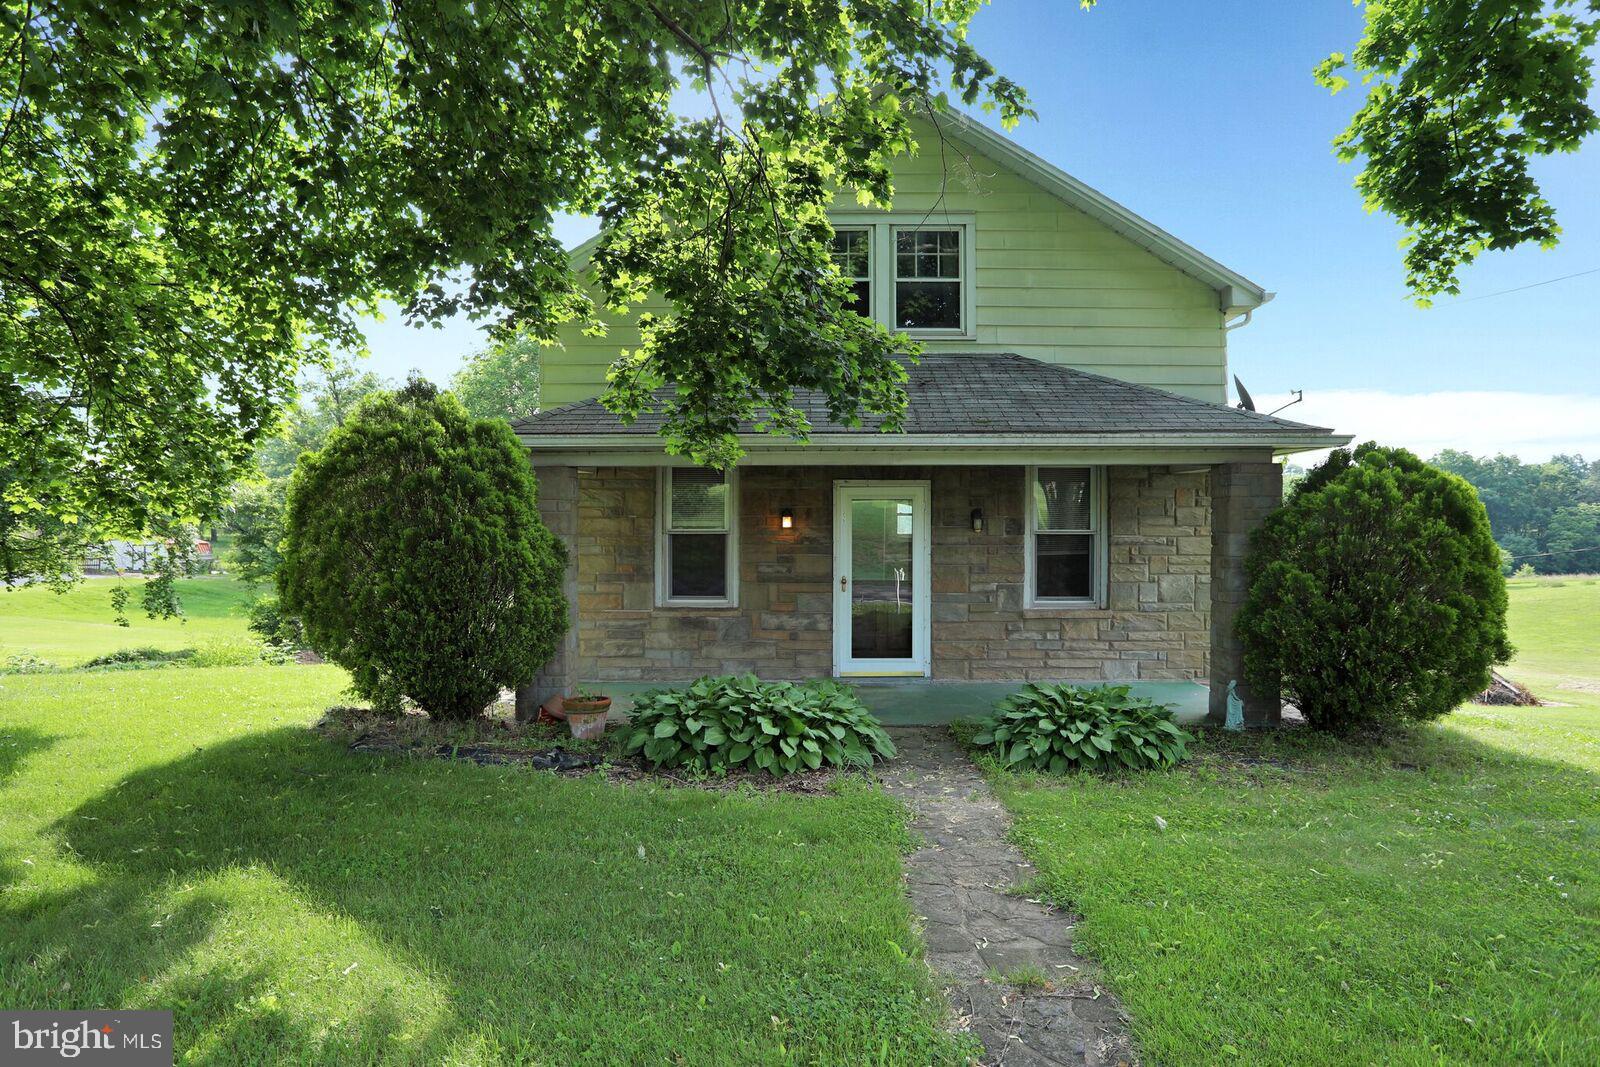 215 WINDY HILL ROAD, SHERMANS DALE, PA 17090